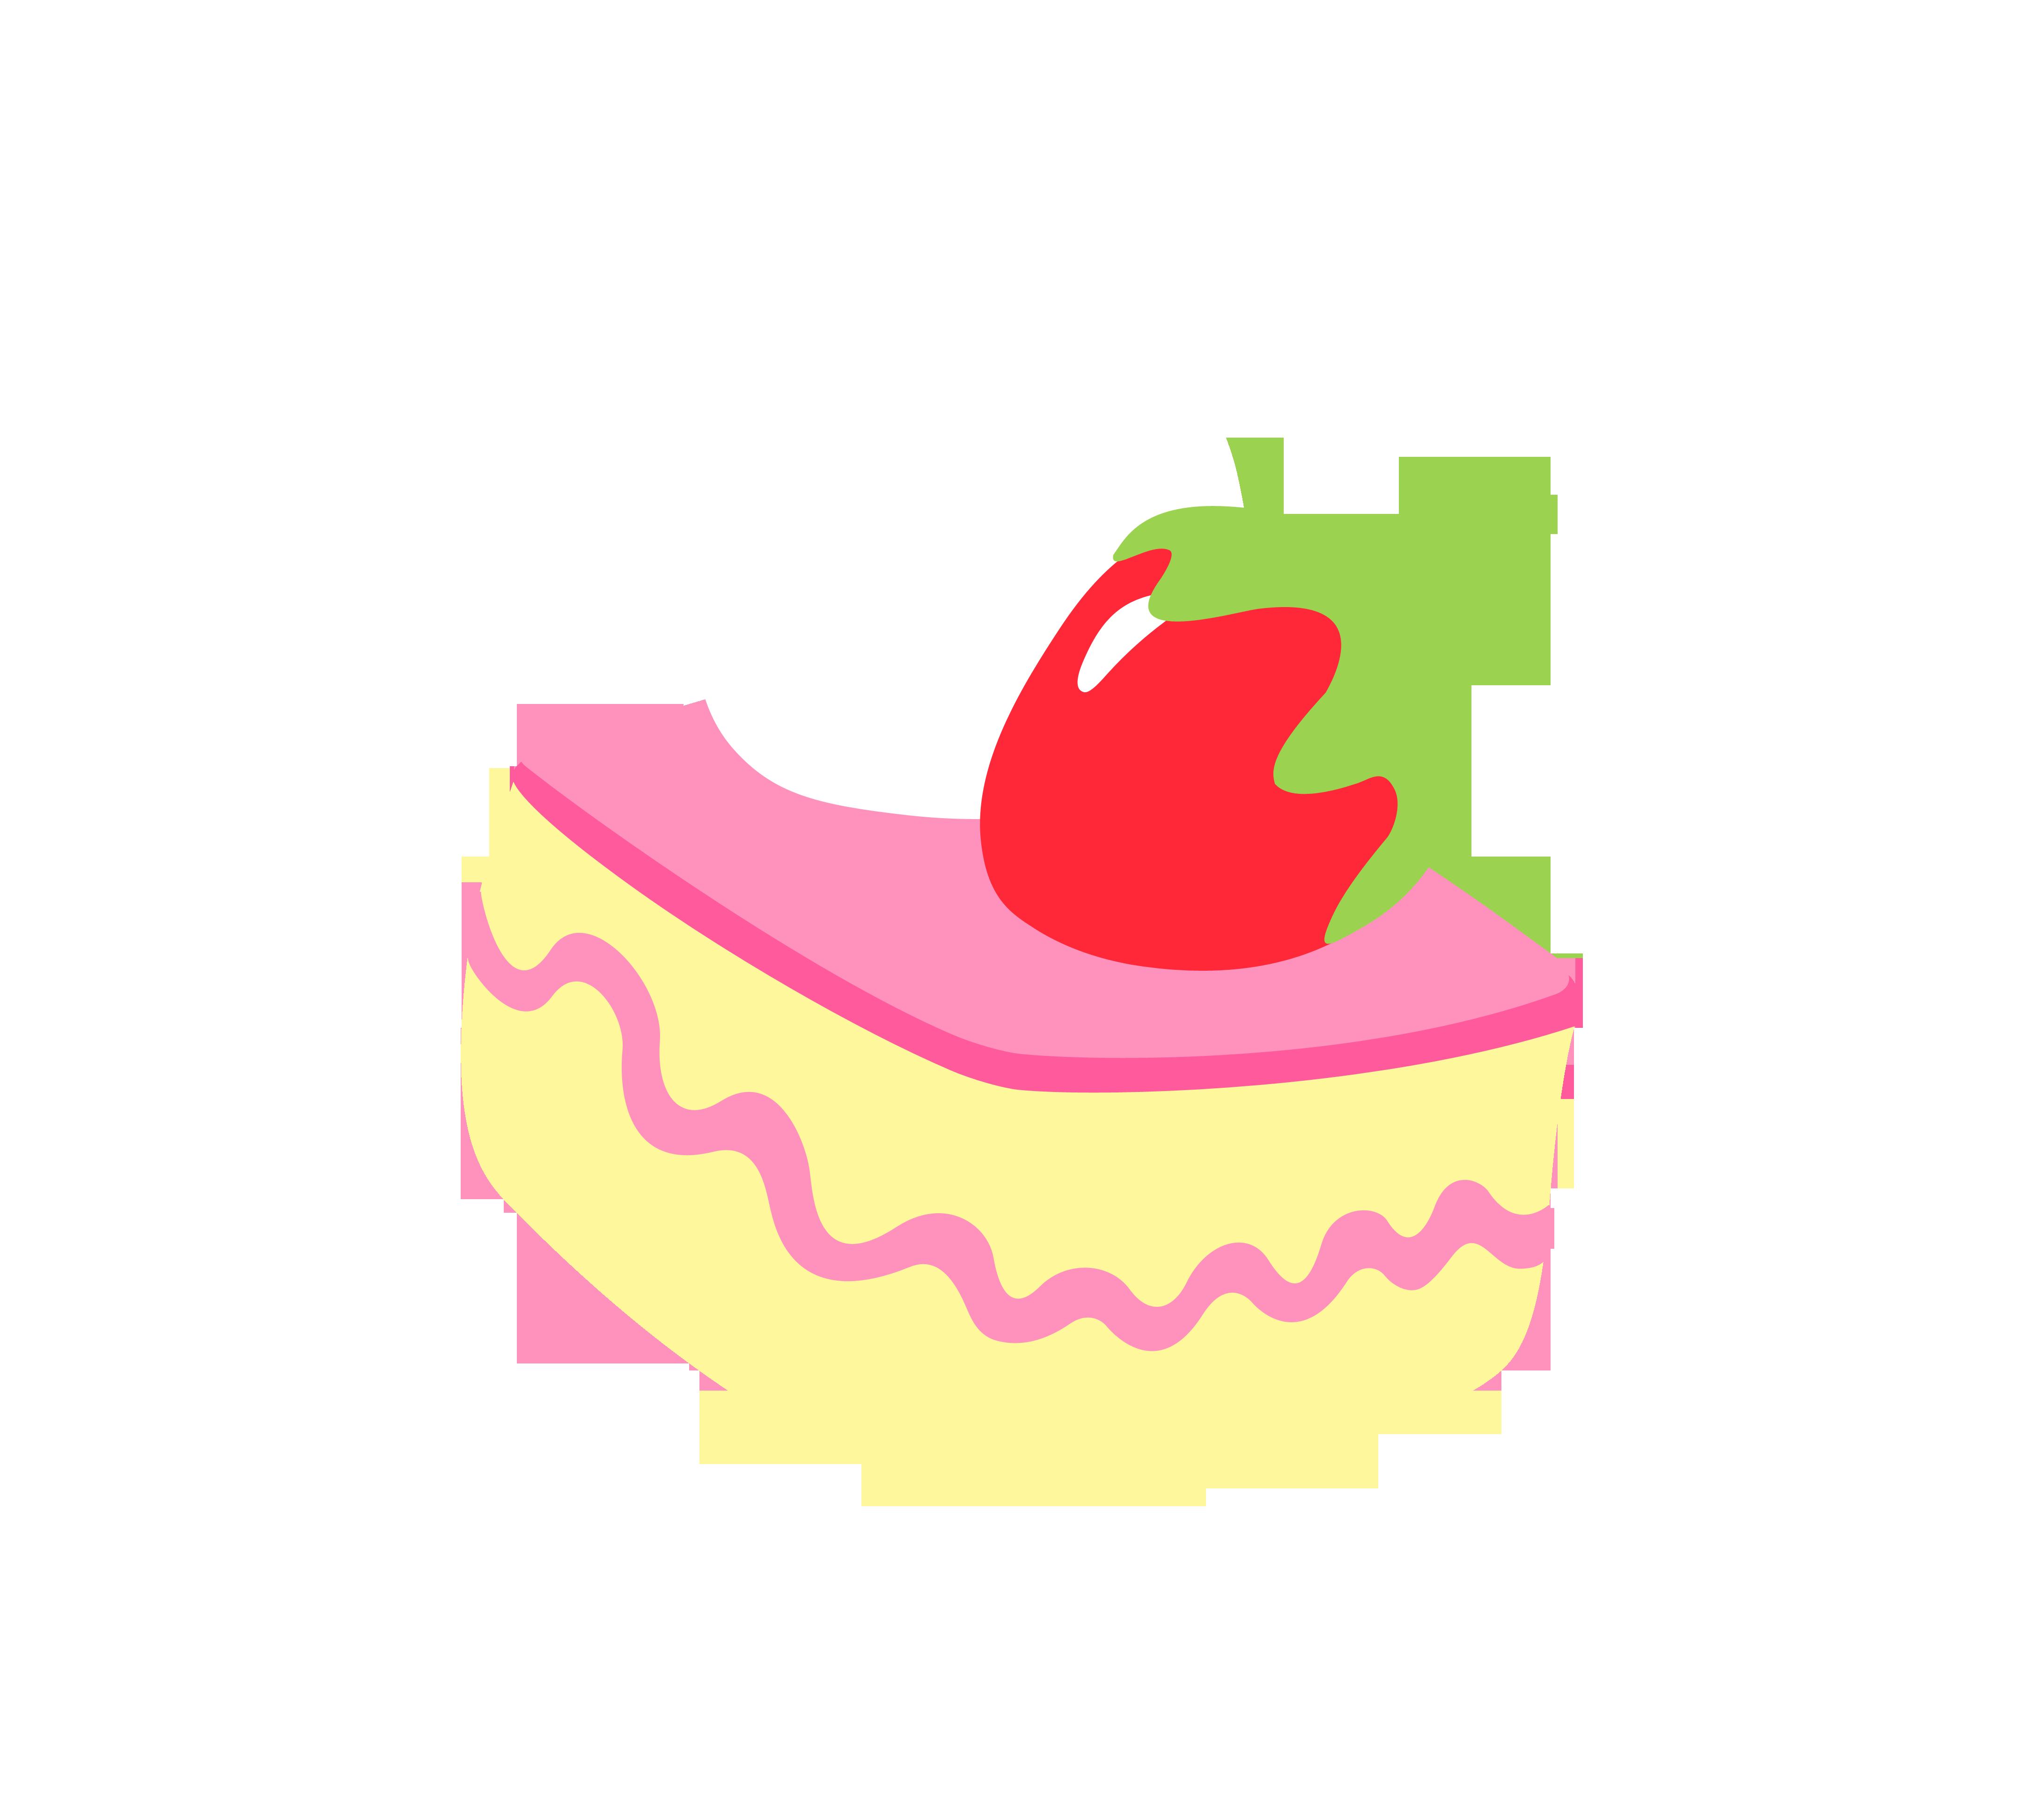 Cutie Mark - Cake (Adventures in Ponyville) by Durpy